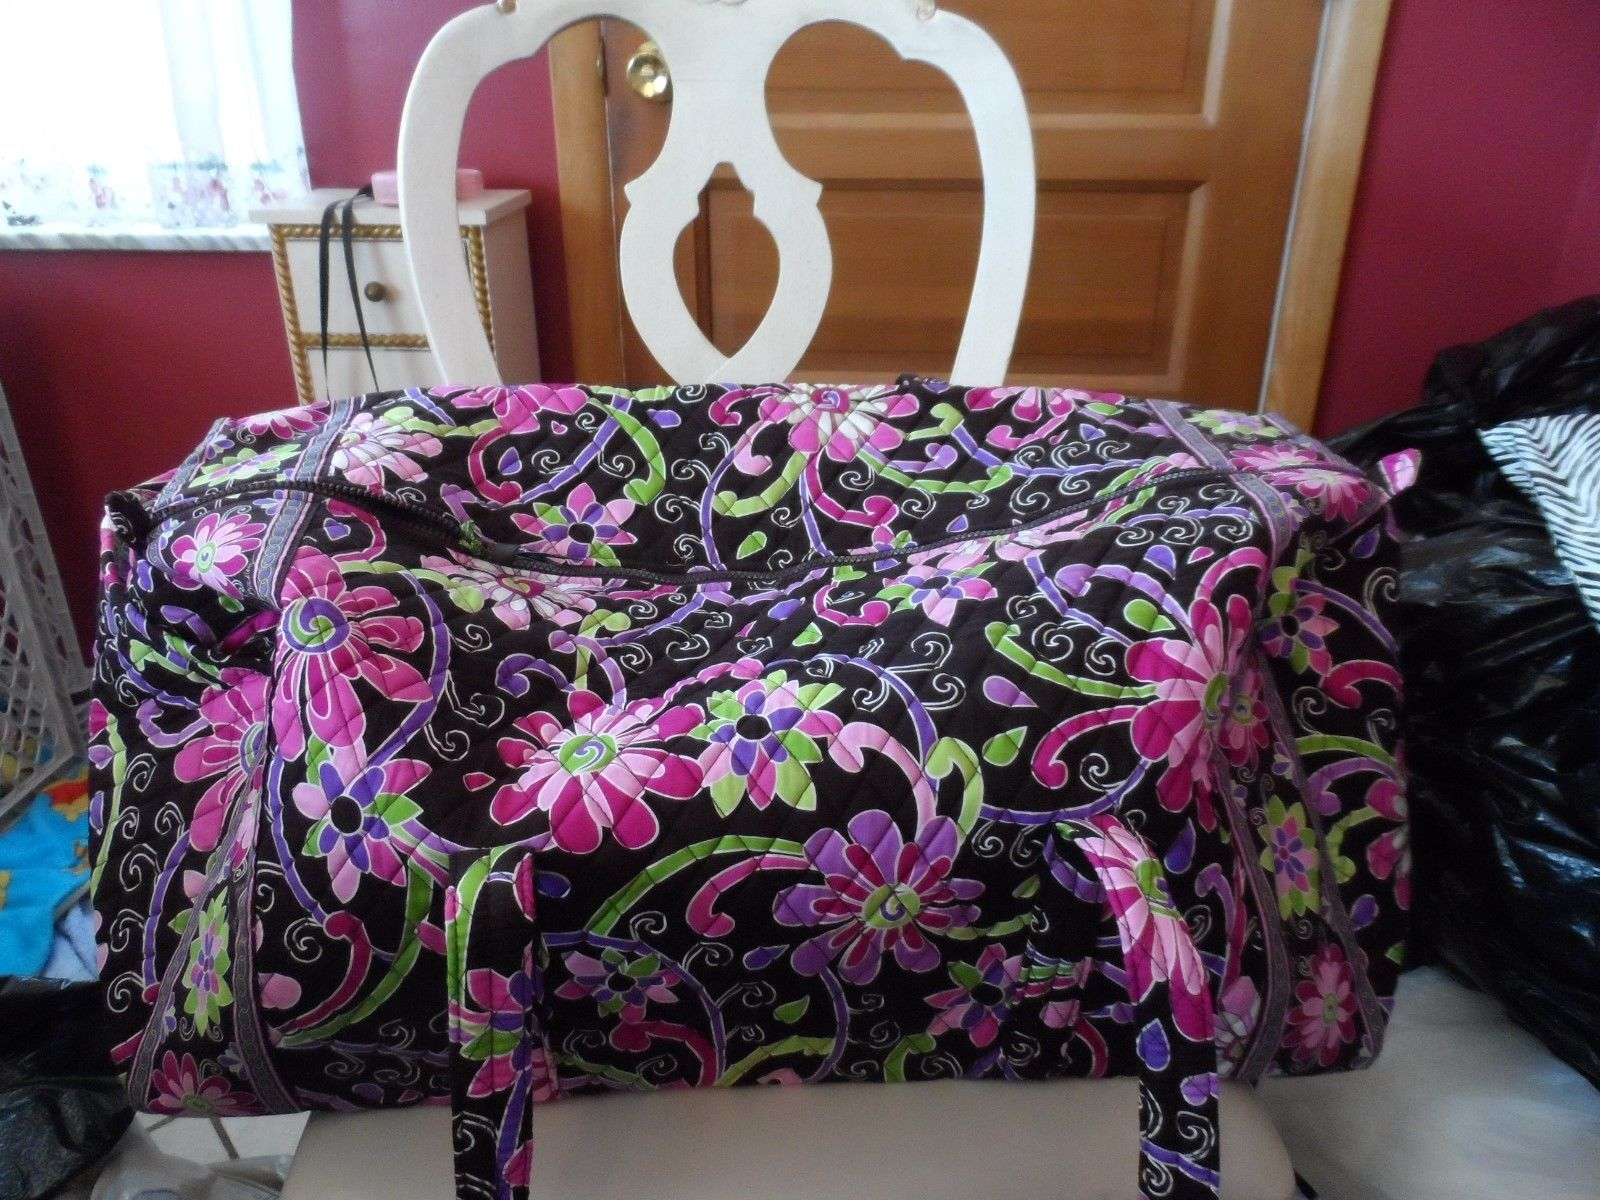 69.99$  Buy now - http://vilxu.justgood.pw/vig/item.php?t=pvme53x55268 - Vera bradley X -large duffel bag in Purple Punch 69.99$